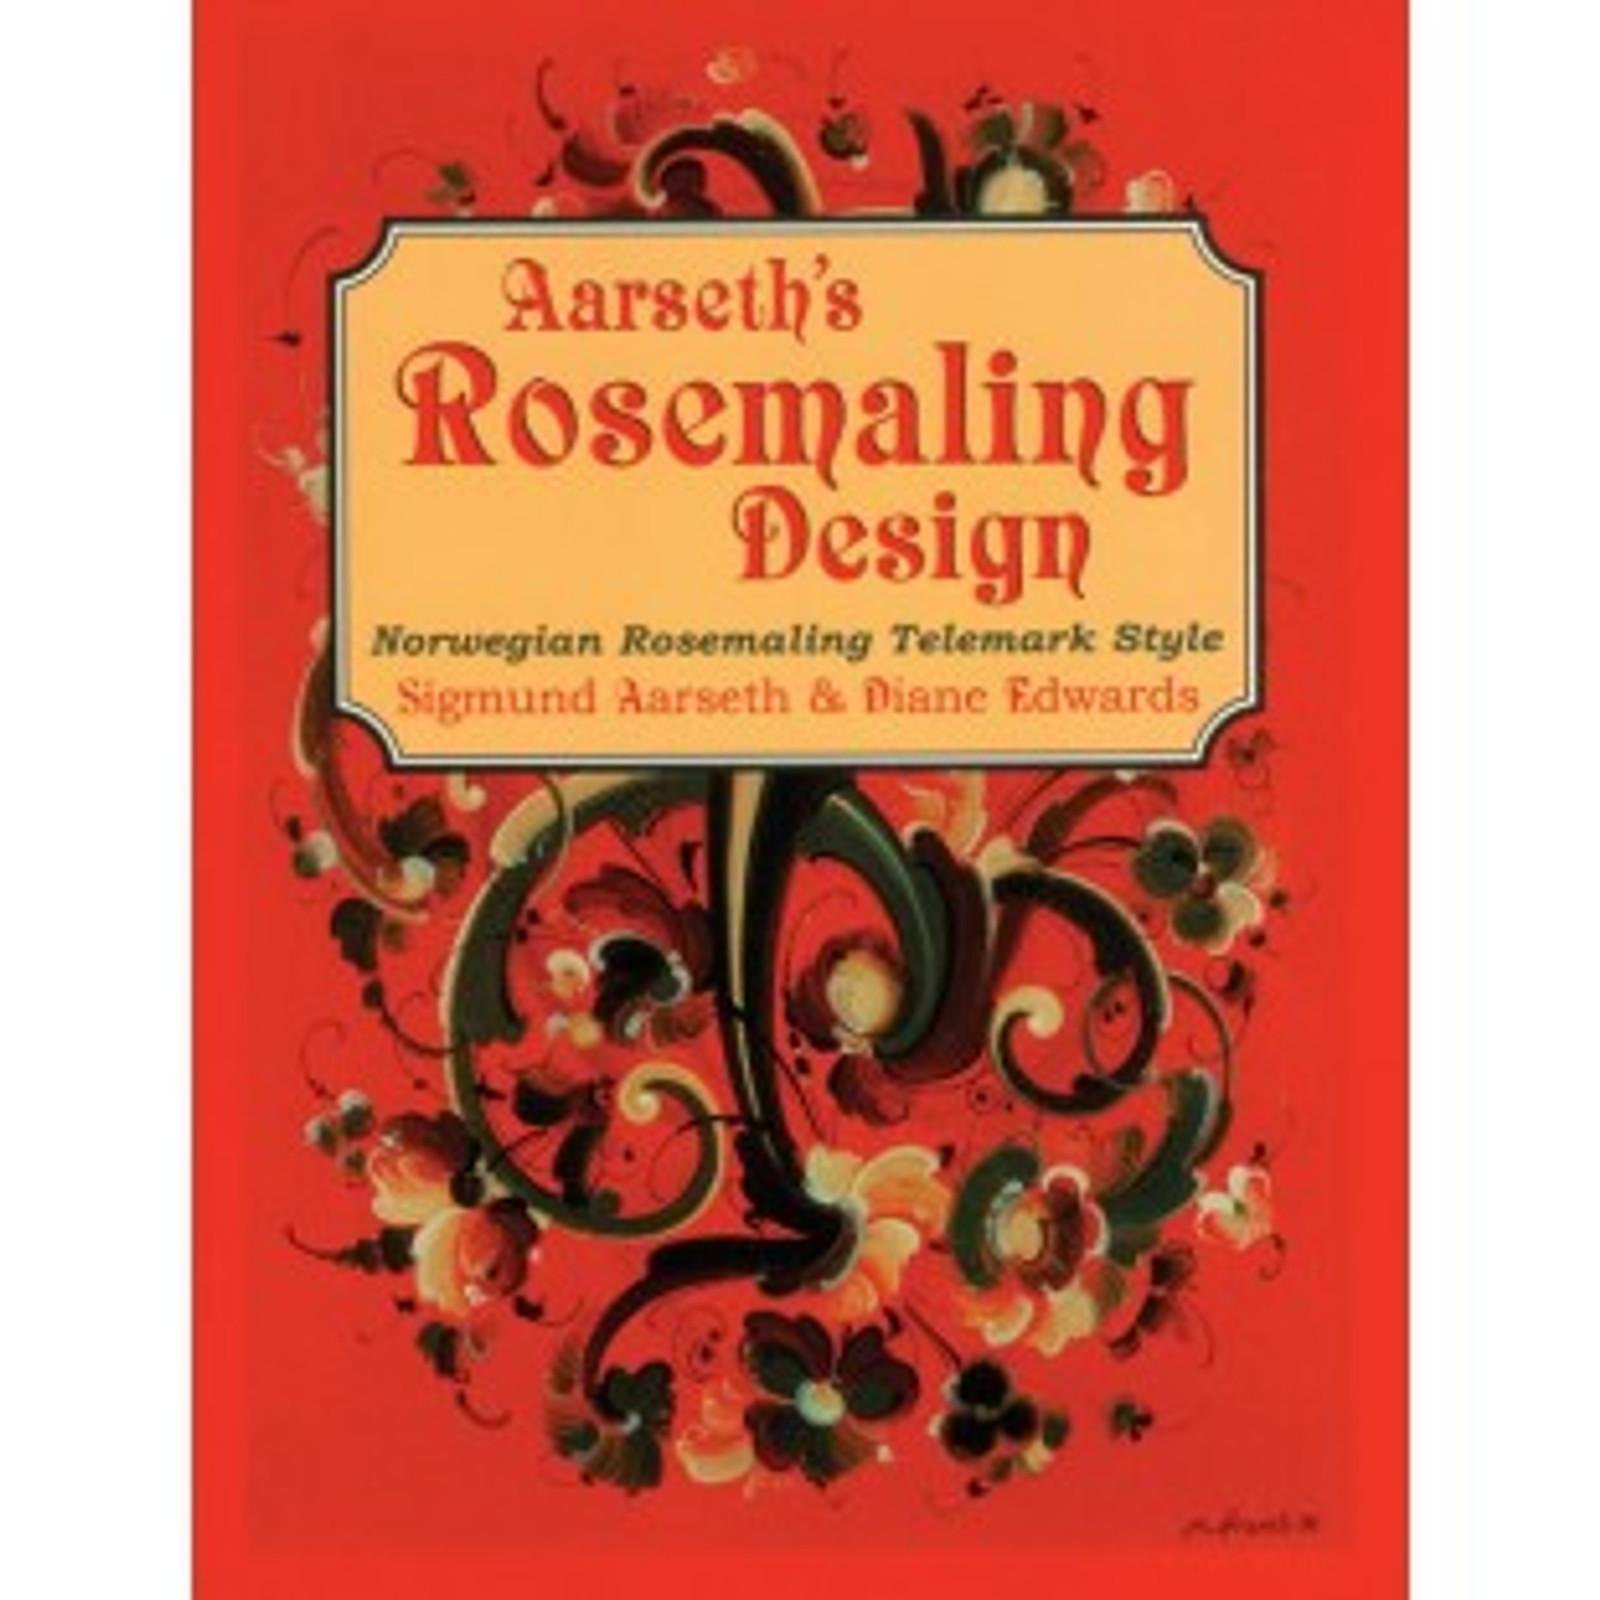 Aarseth's Rosemaling Design, Sigmund Aarseth